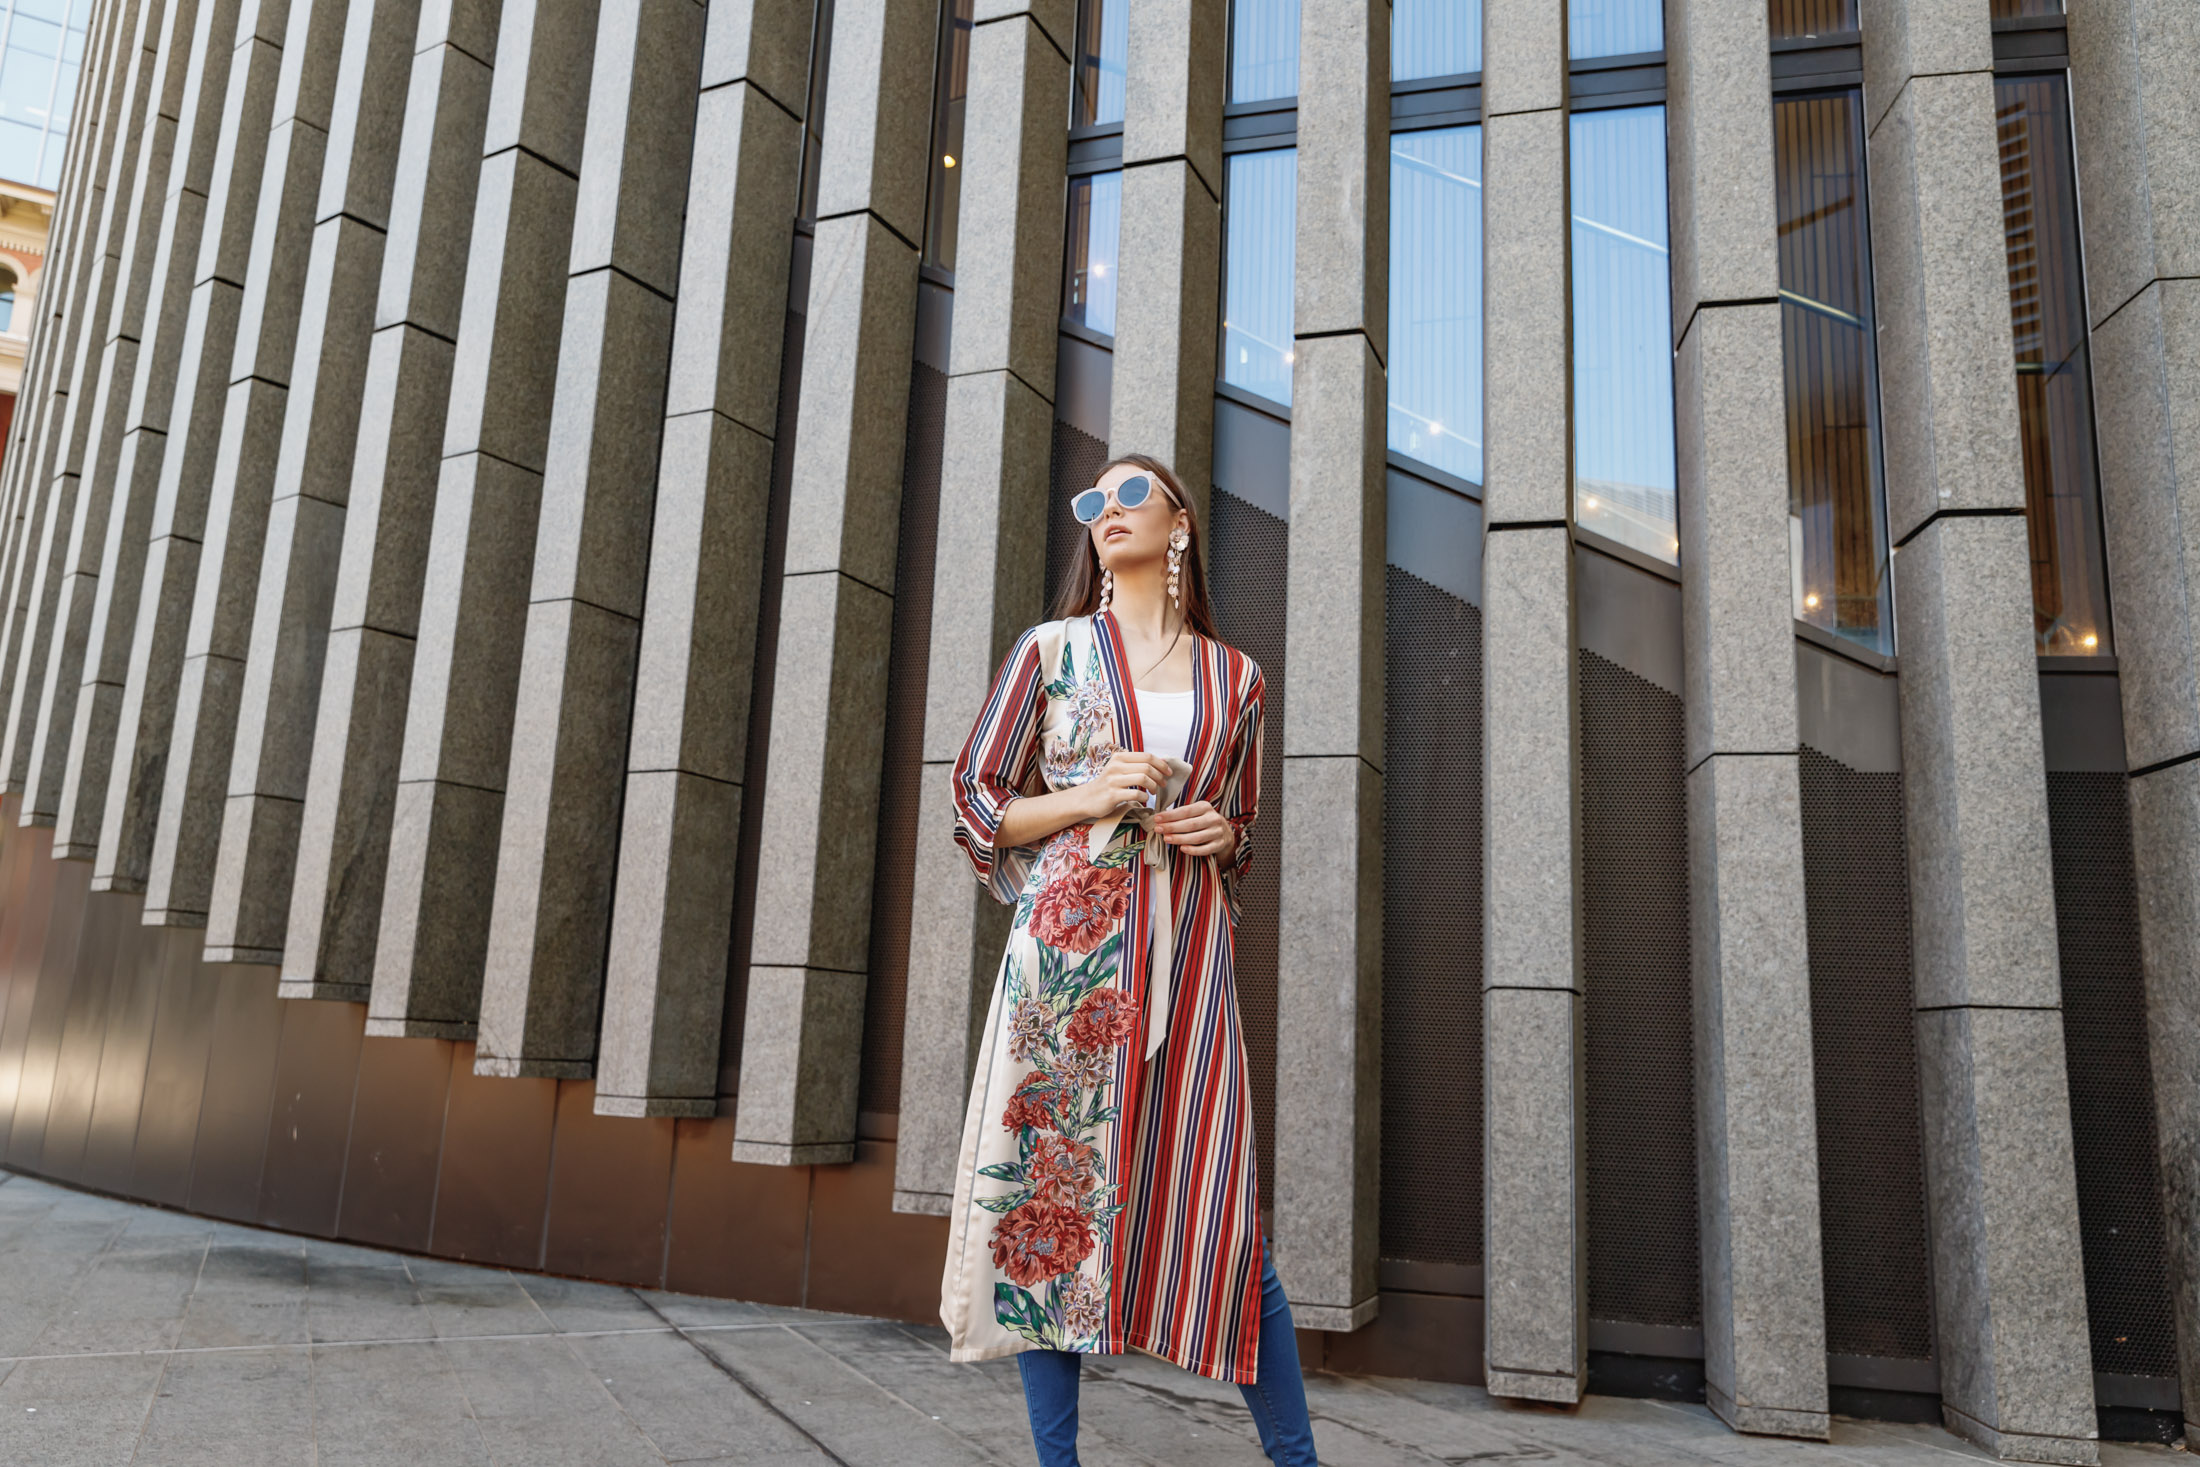 Ammon_Creative-Fashion_Photography-Vogue_Sultana_Bangladesh-Old_Treasury-Perth-007-0132.jpg